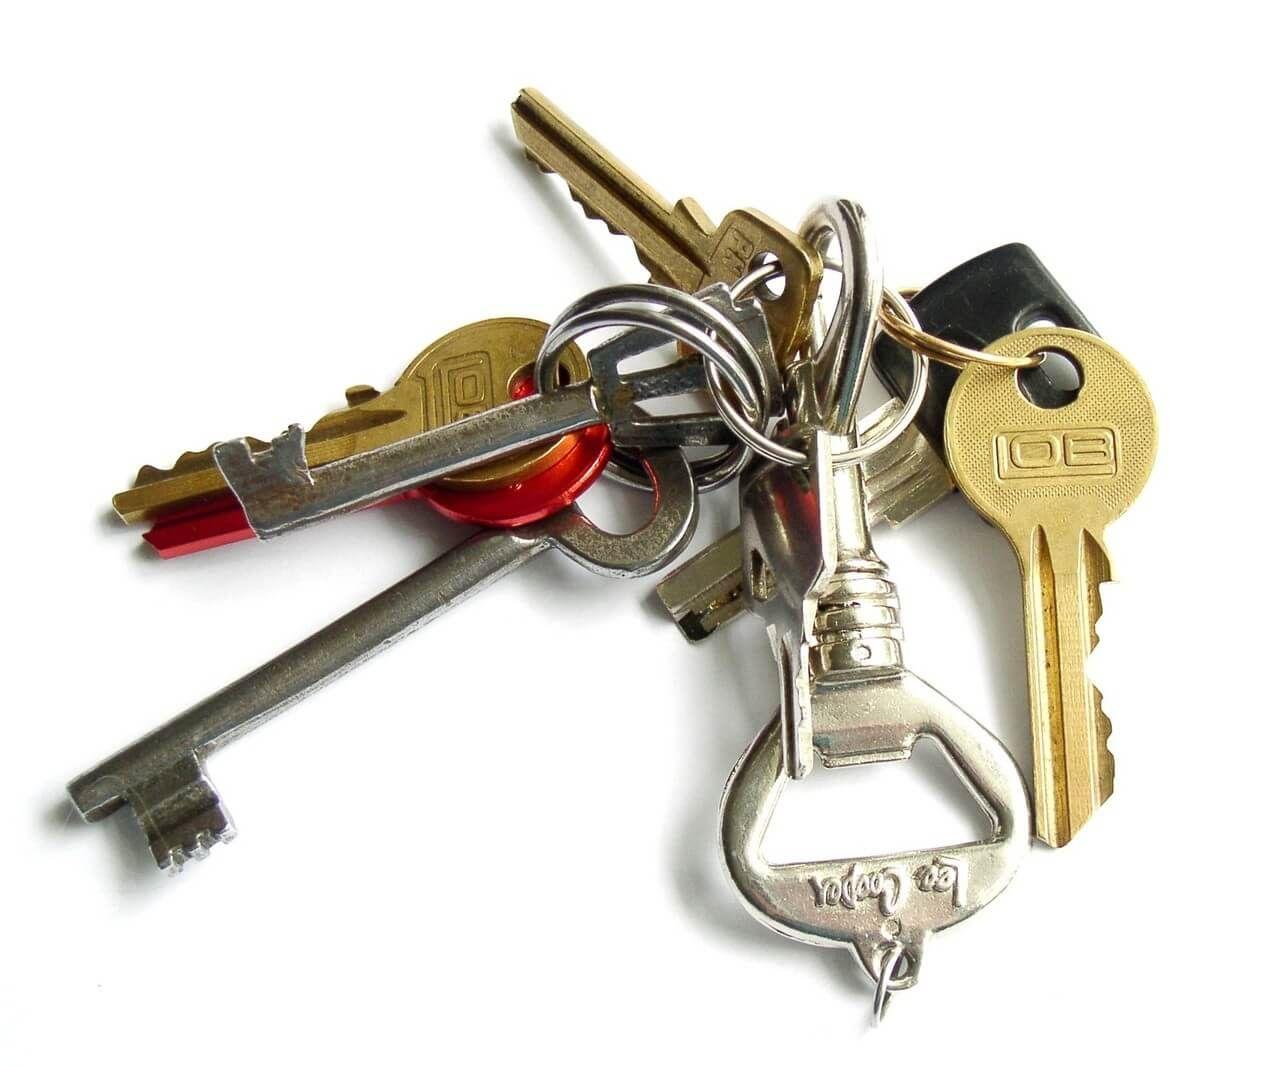 Lock Patrol Locksmith Call 425.454.1299 if you need a